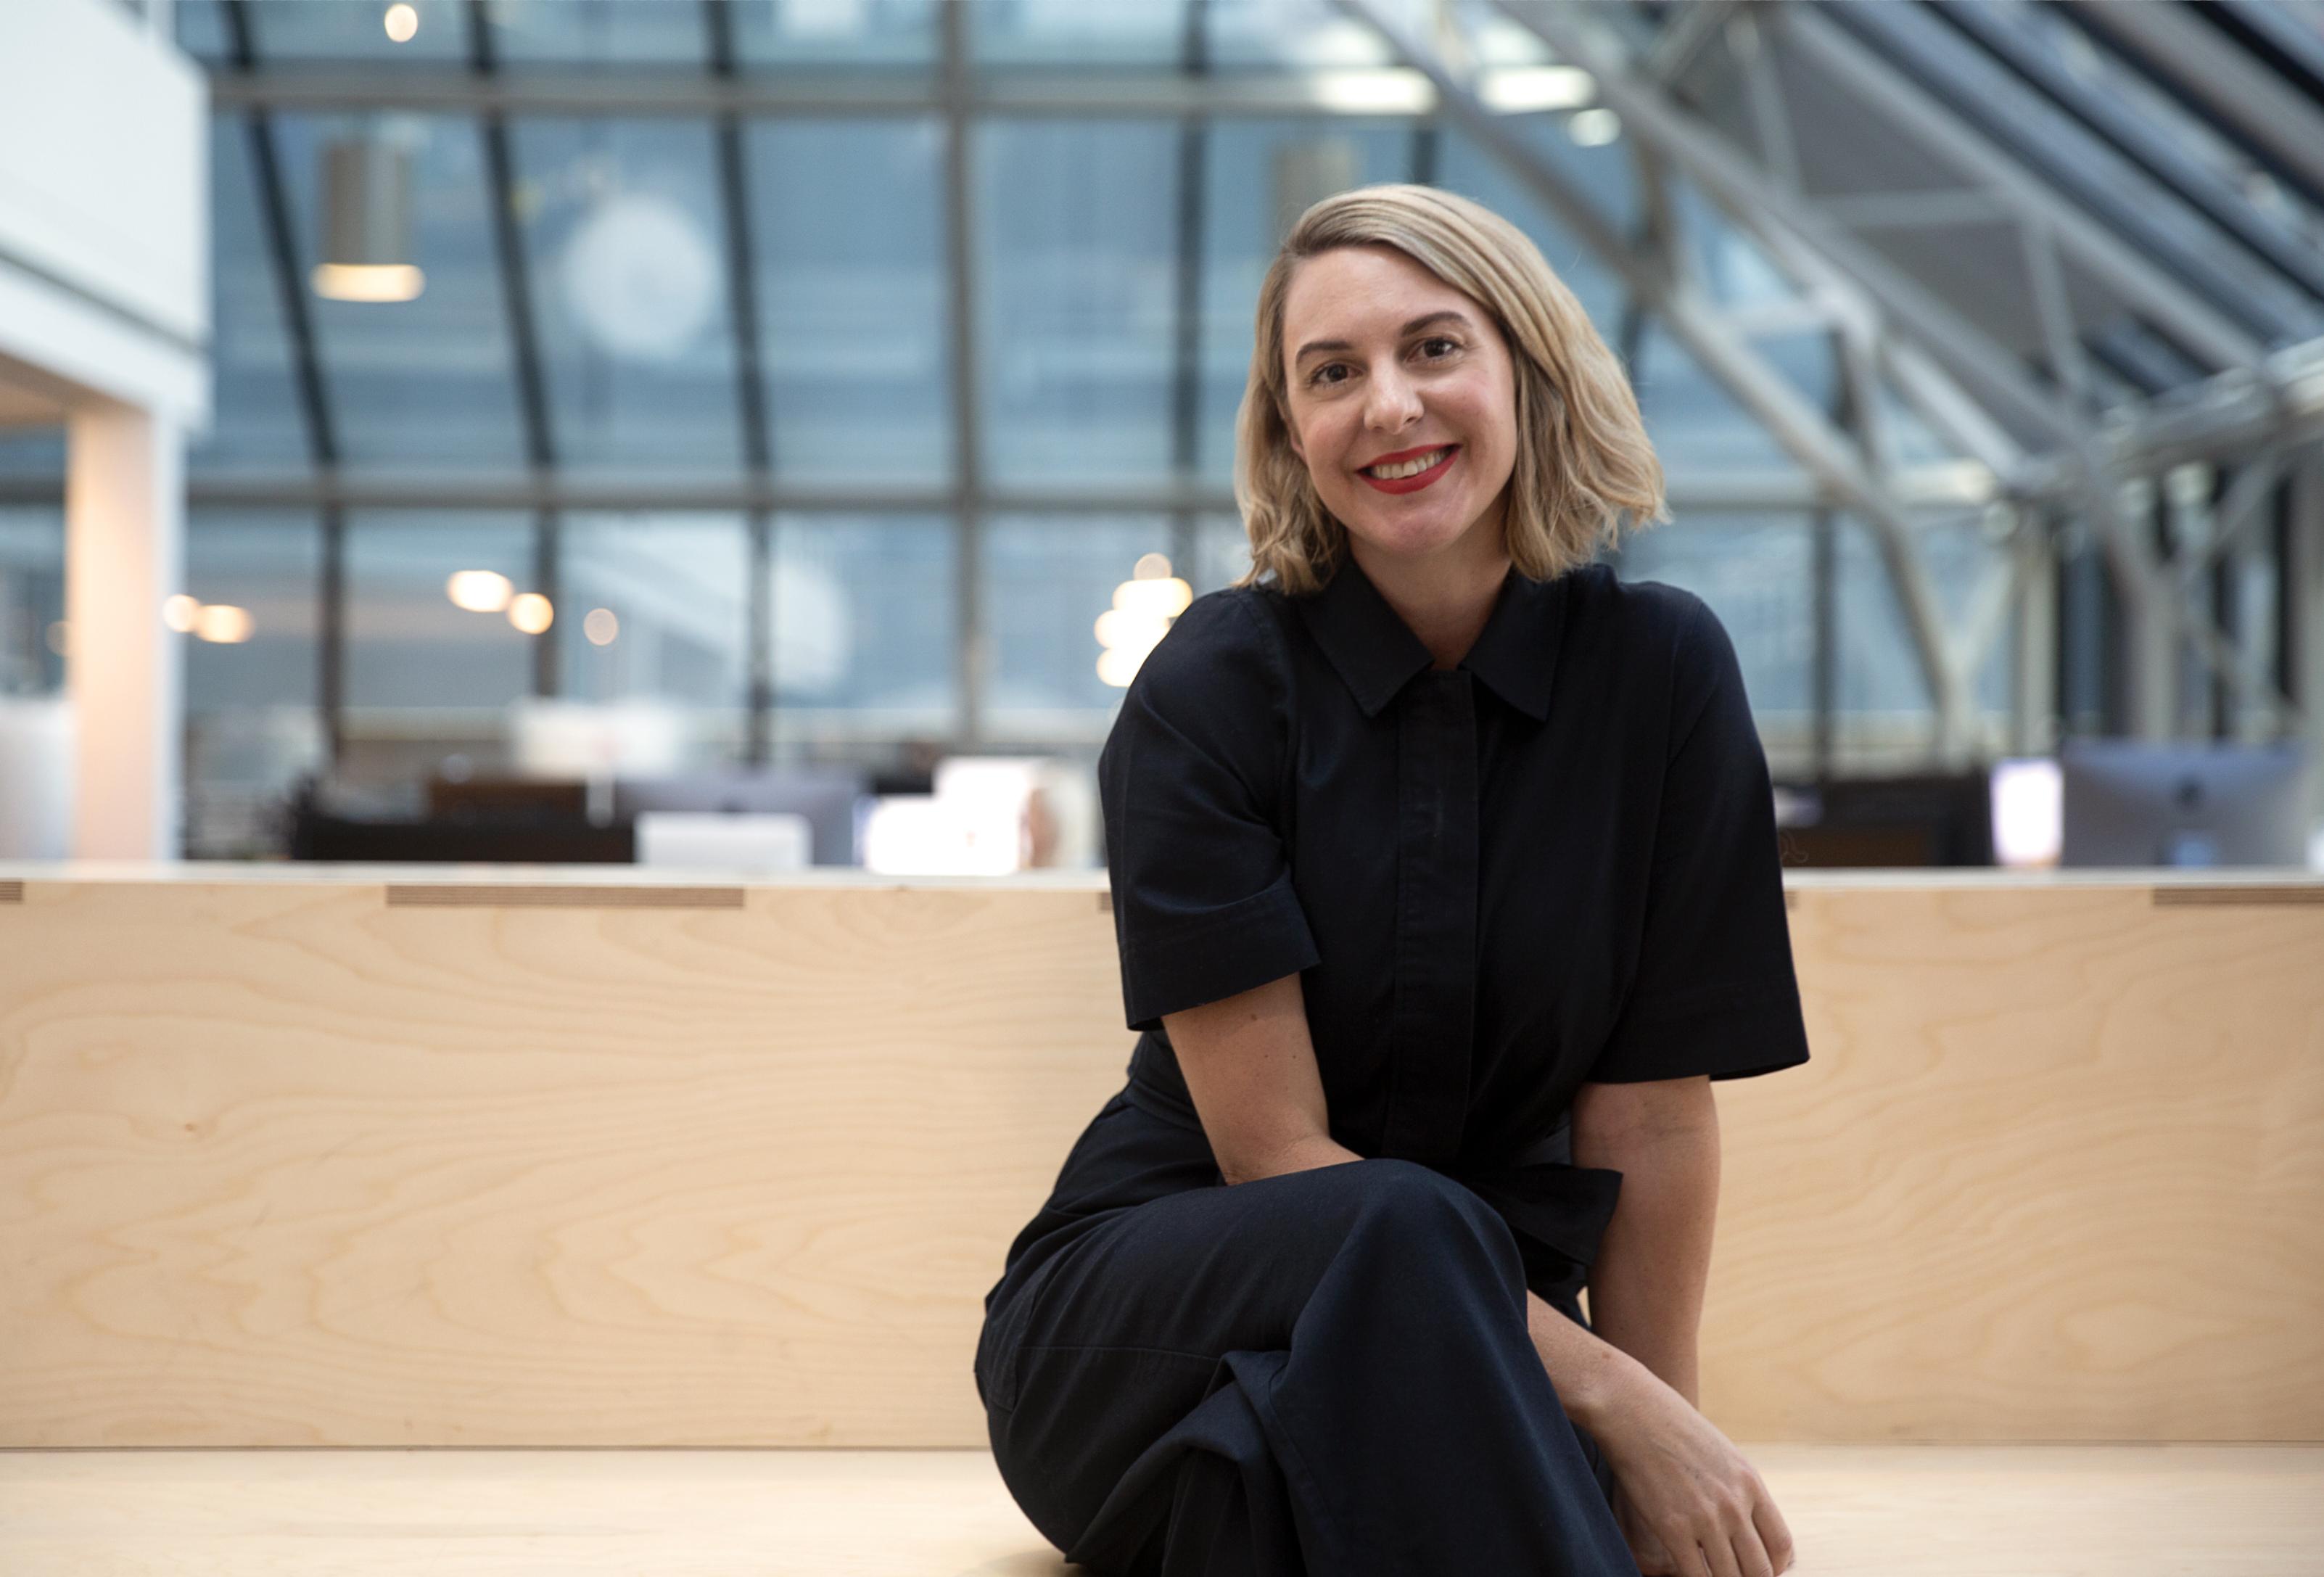 Lea Egan Joins Clemenger BBDO Melbourne as Creative Director